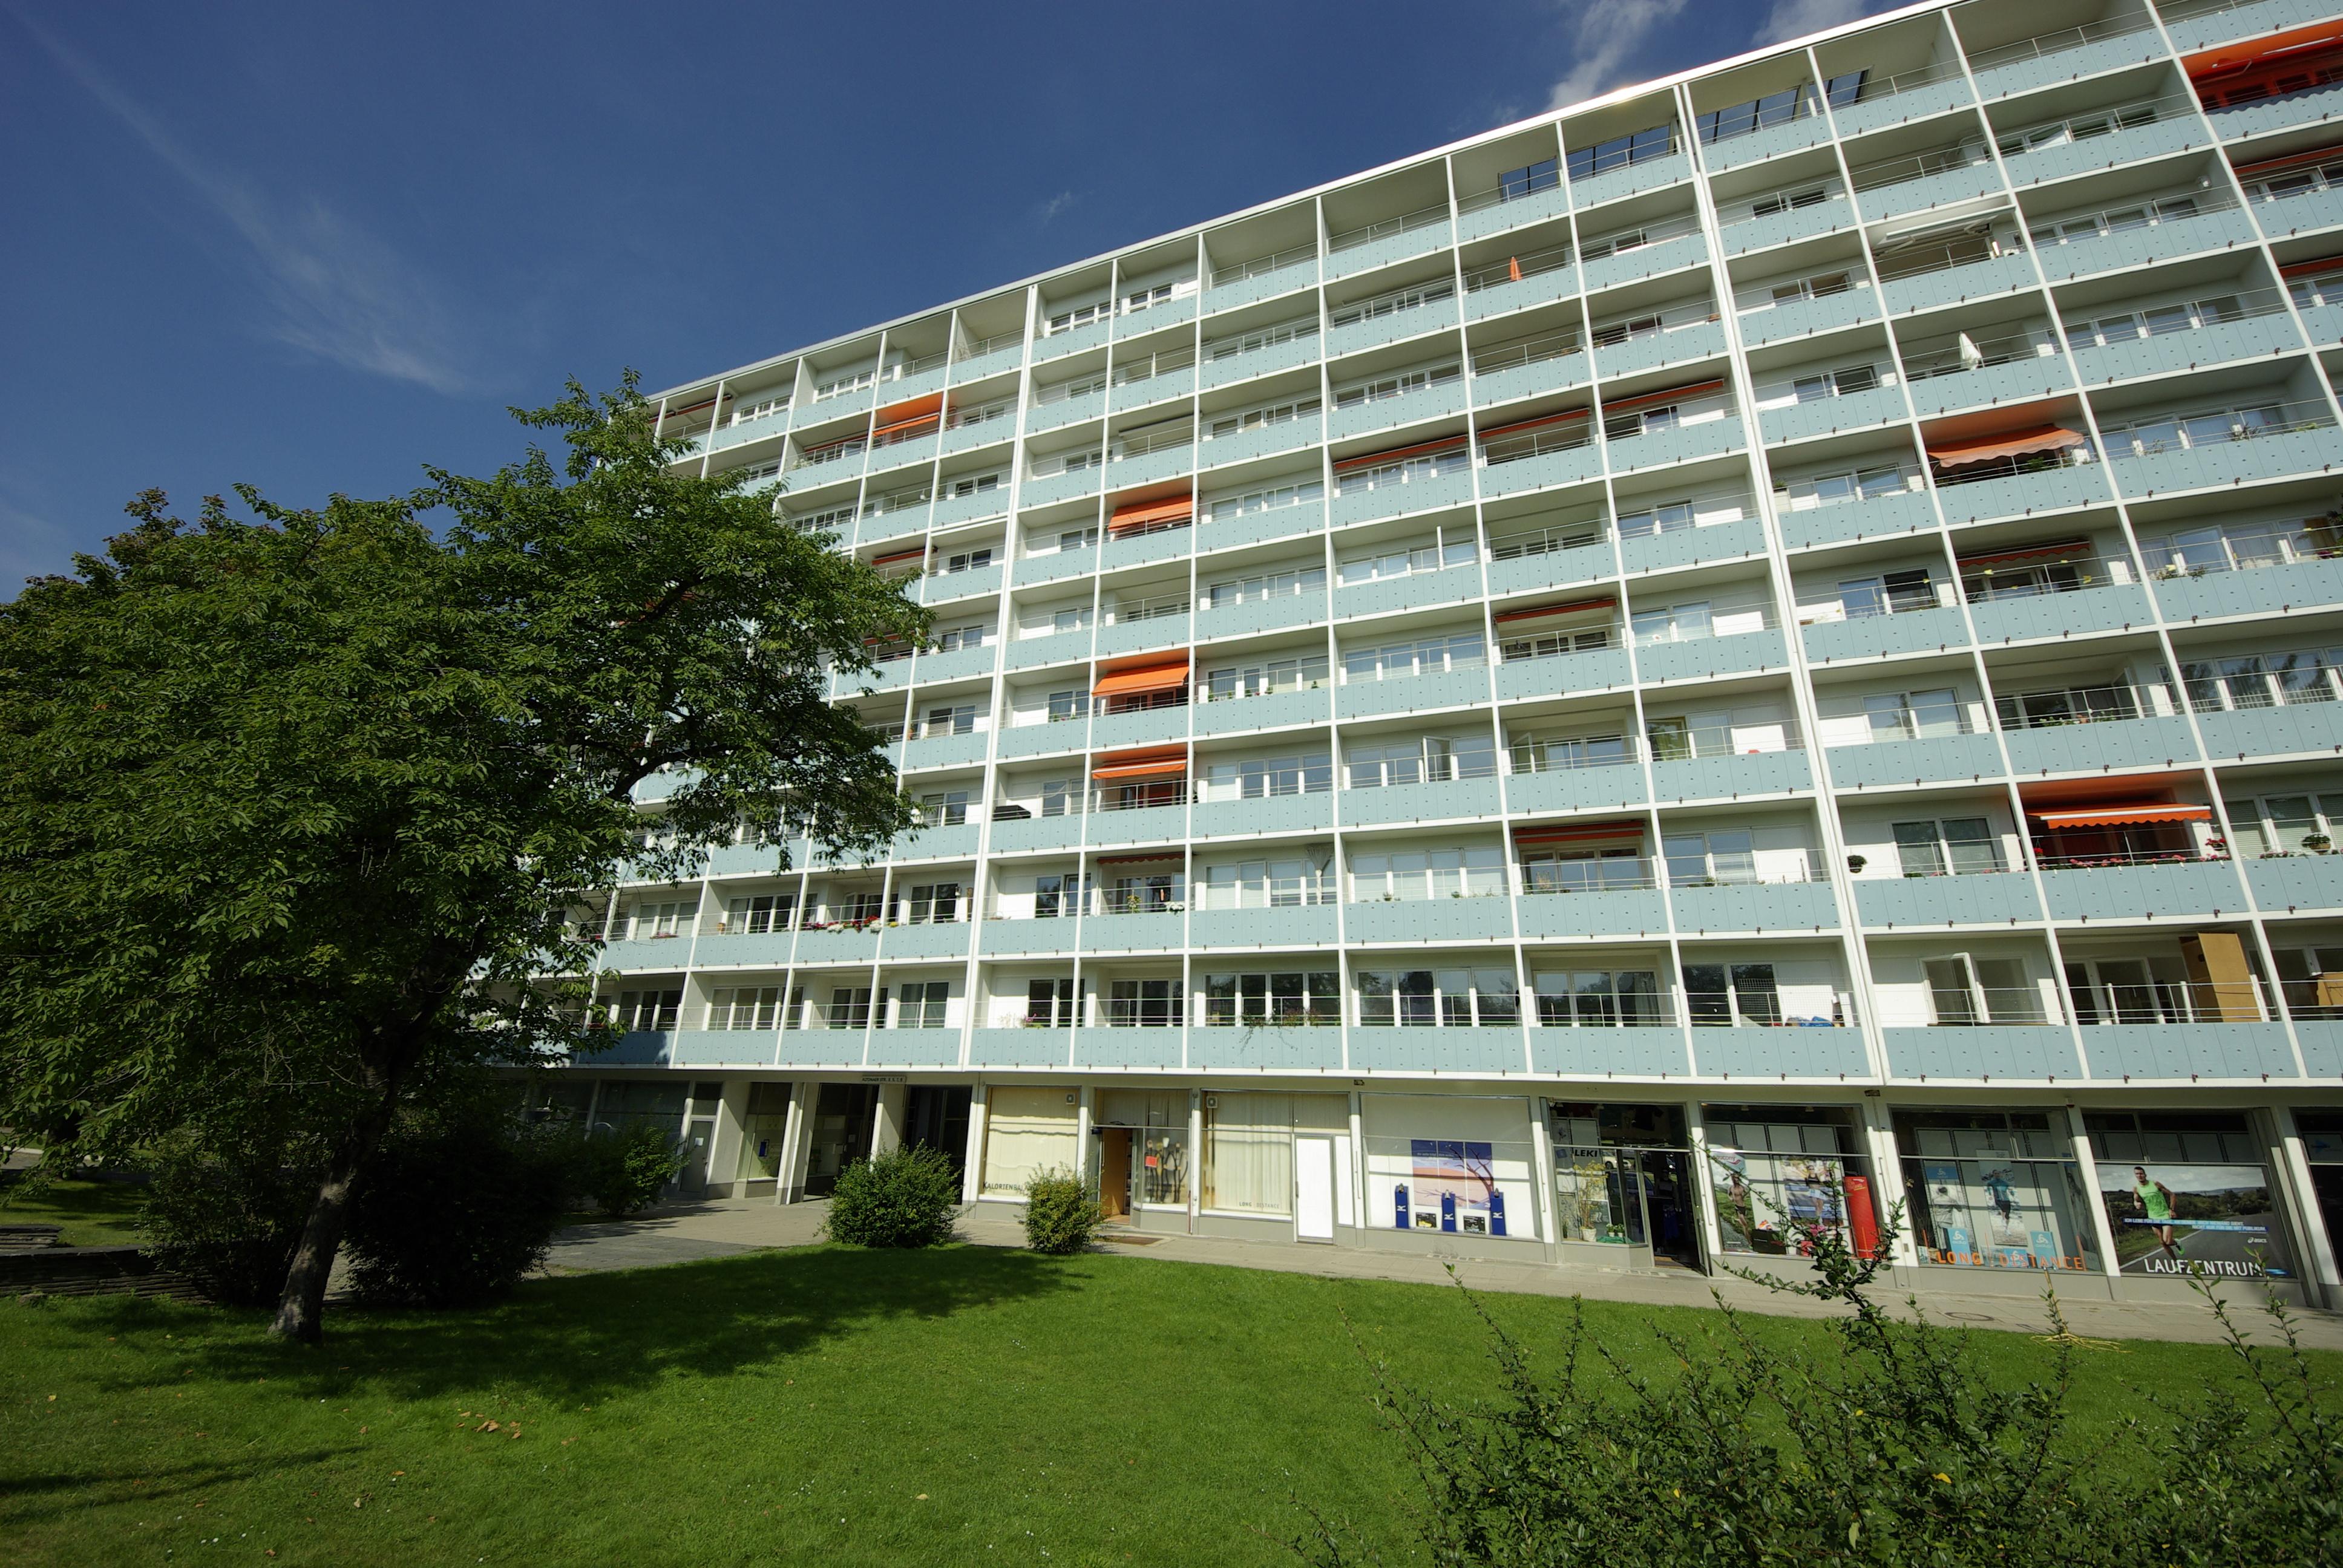 Schwedenhaus Berlin file berlin hansaviertel schwedenhaus 003 jpg wikimedia commons